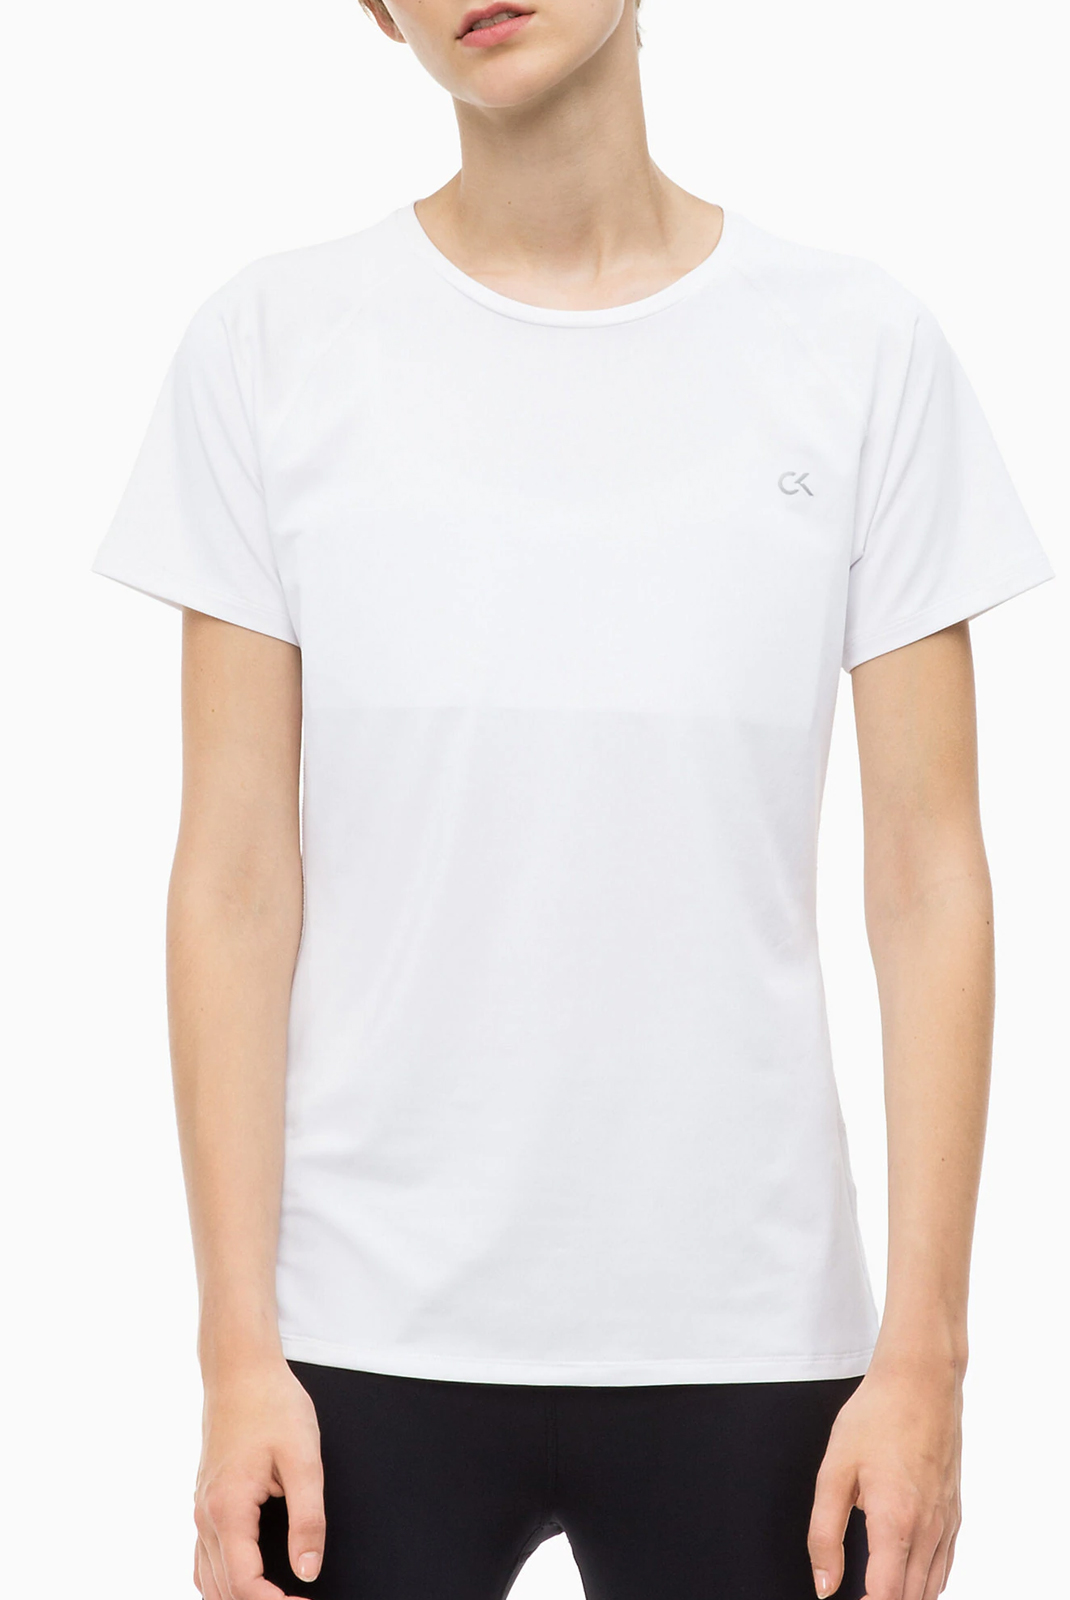 Tee shirt  Calvin klein 00GWF8K140-100 Bright White